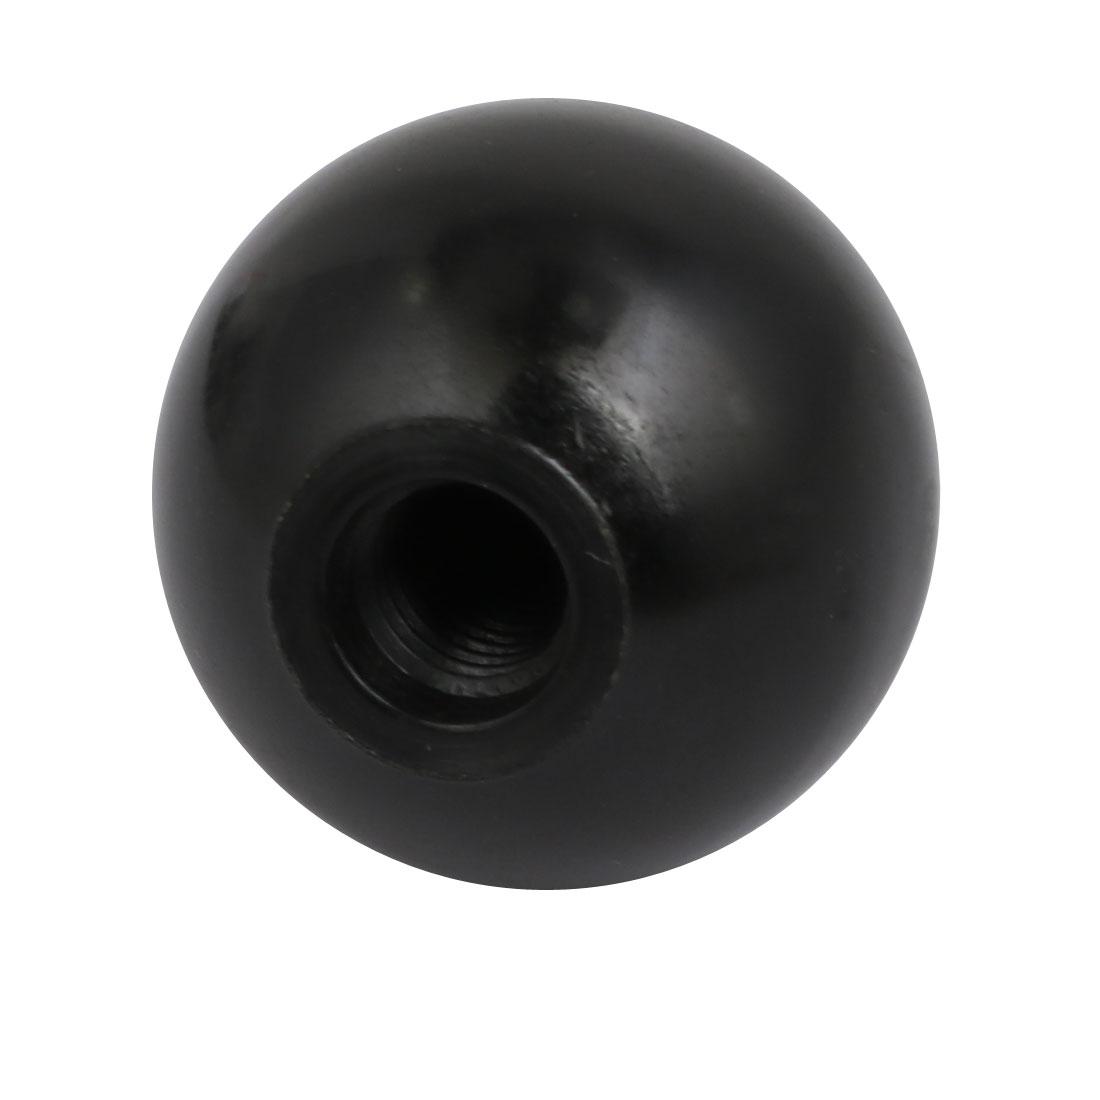 35mm Dia M10 Female Threaded Plastic Round Handle Ball Knob Black